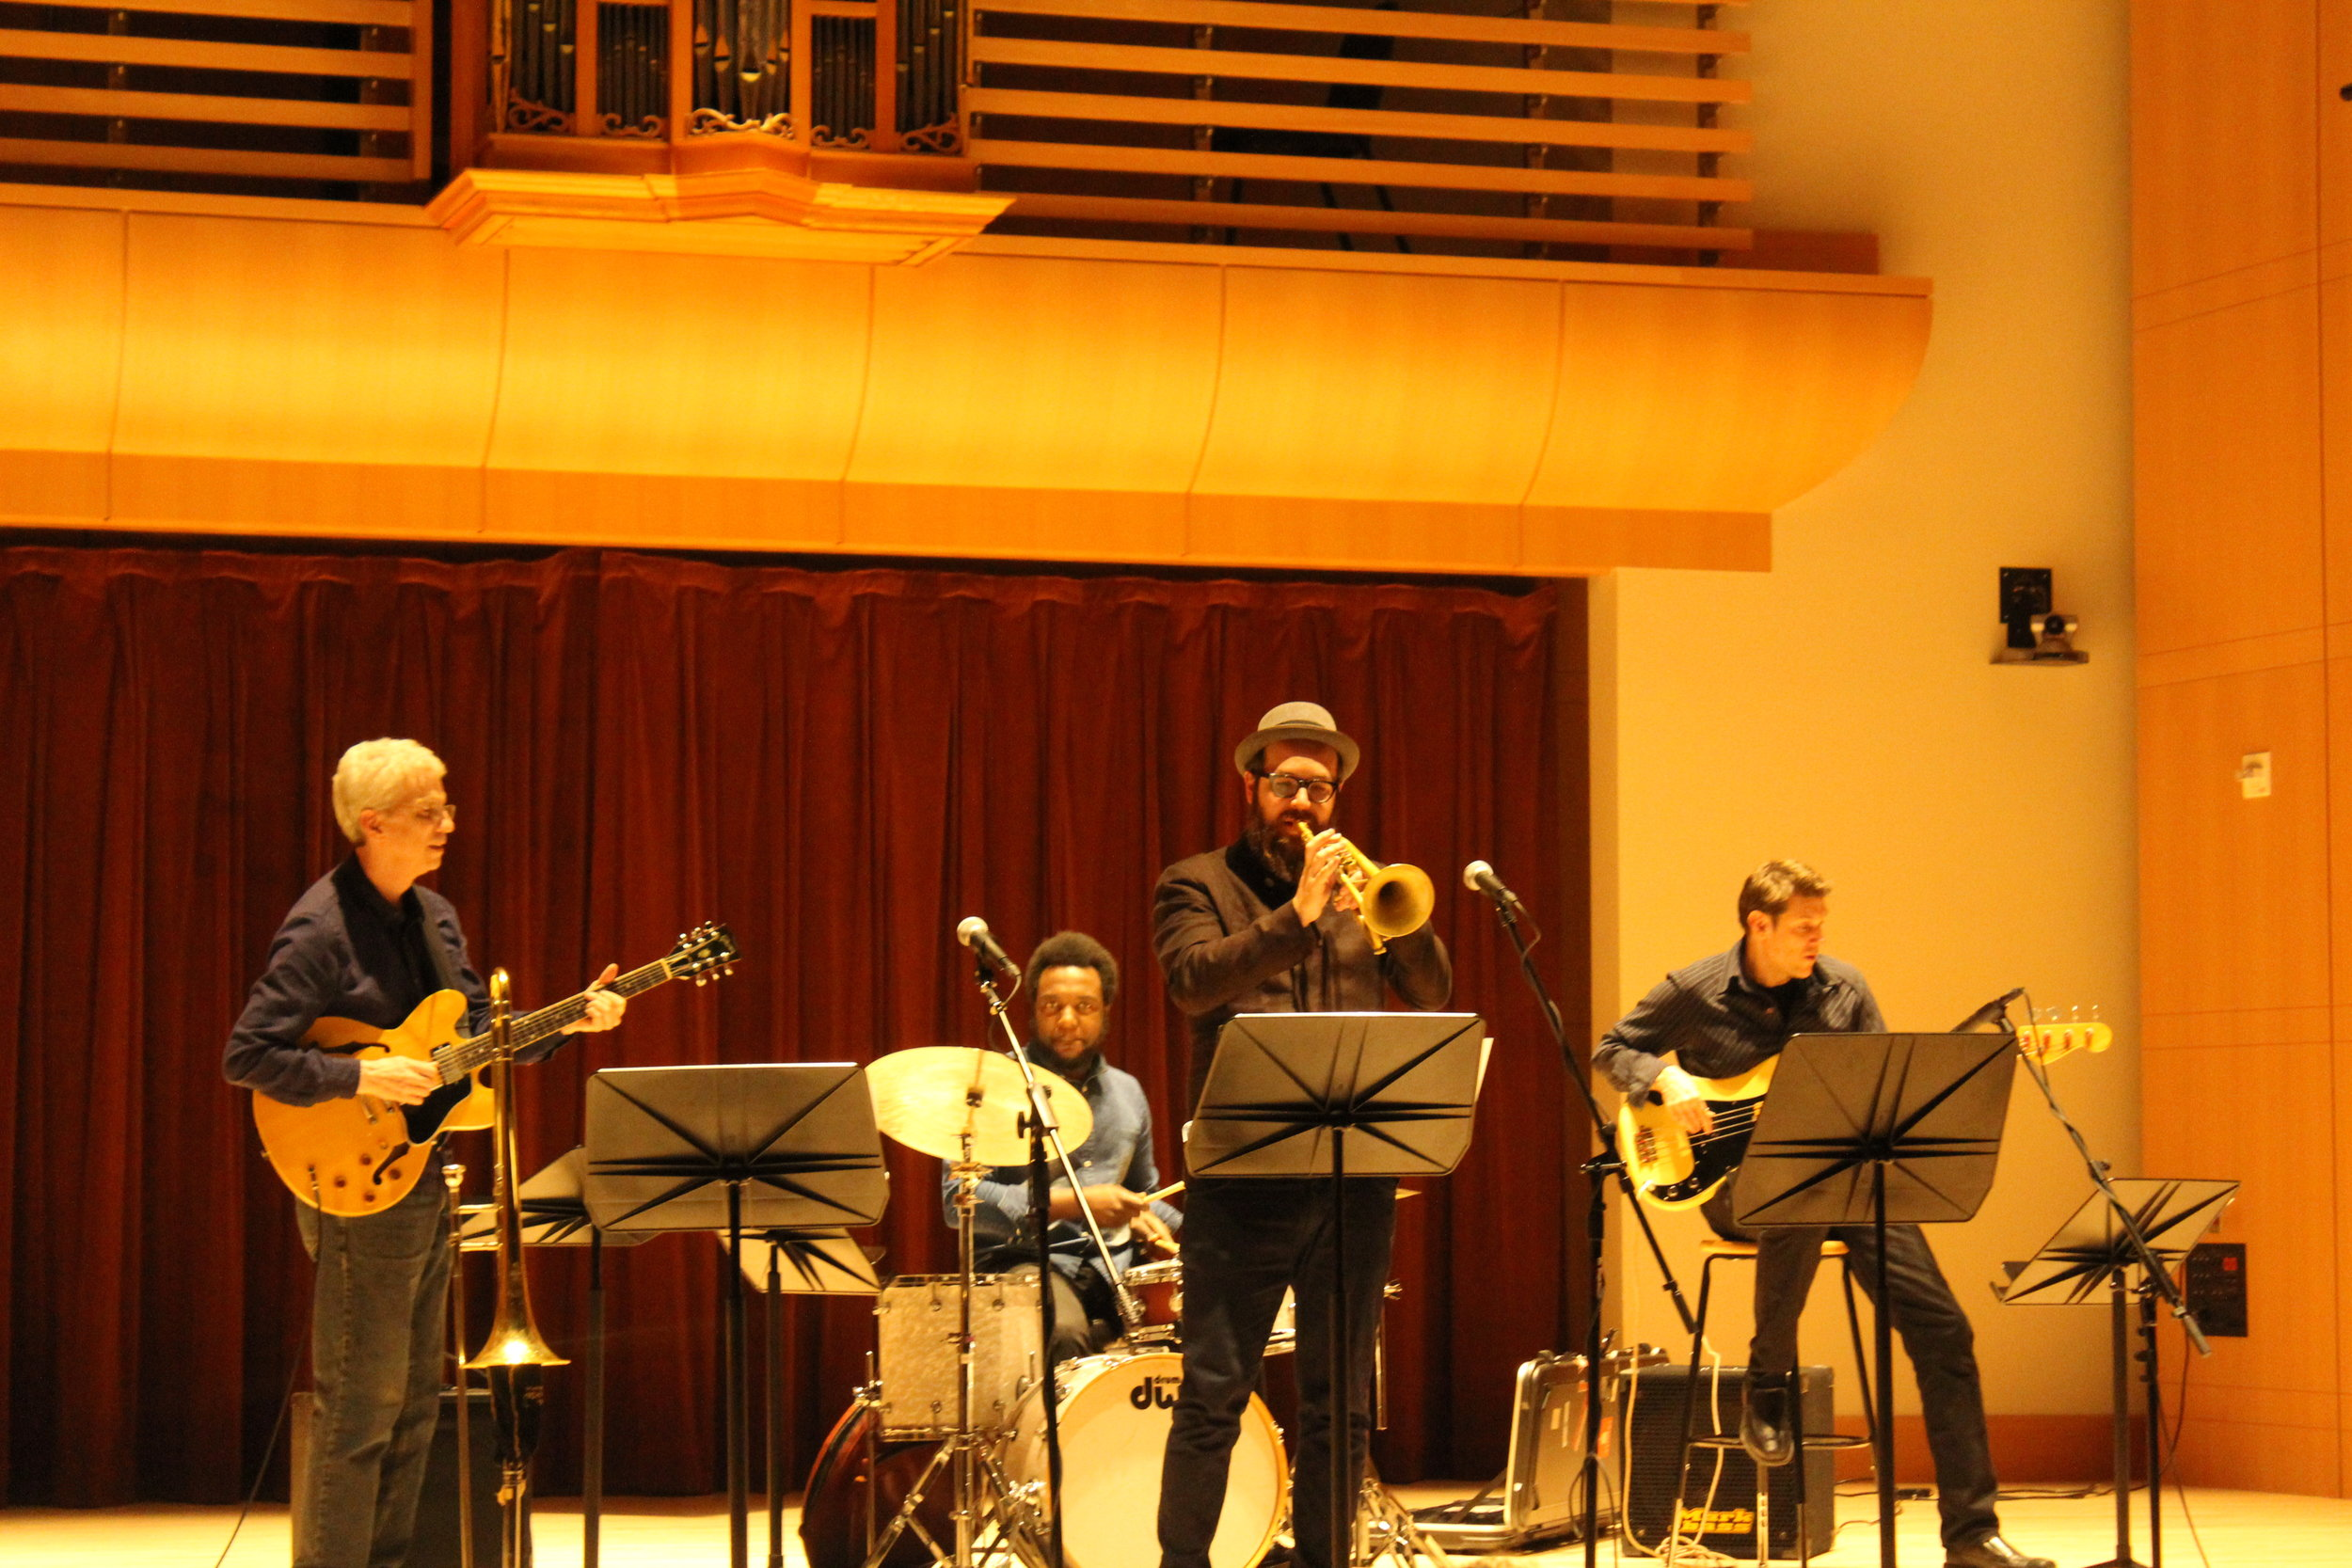 faculty-composers-concert-jade-eriksson_32475440613_o.jpg